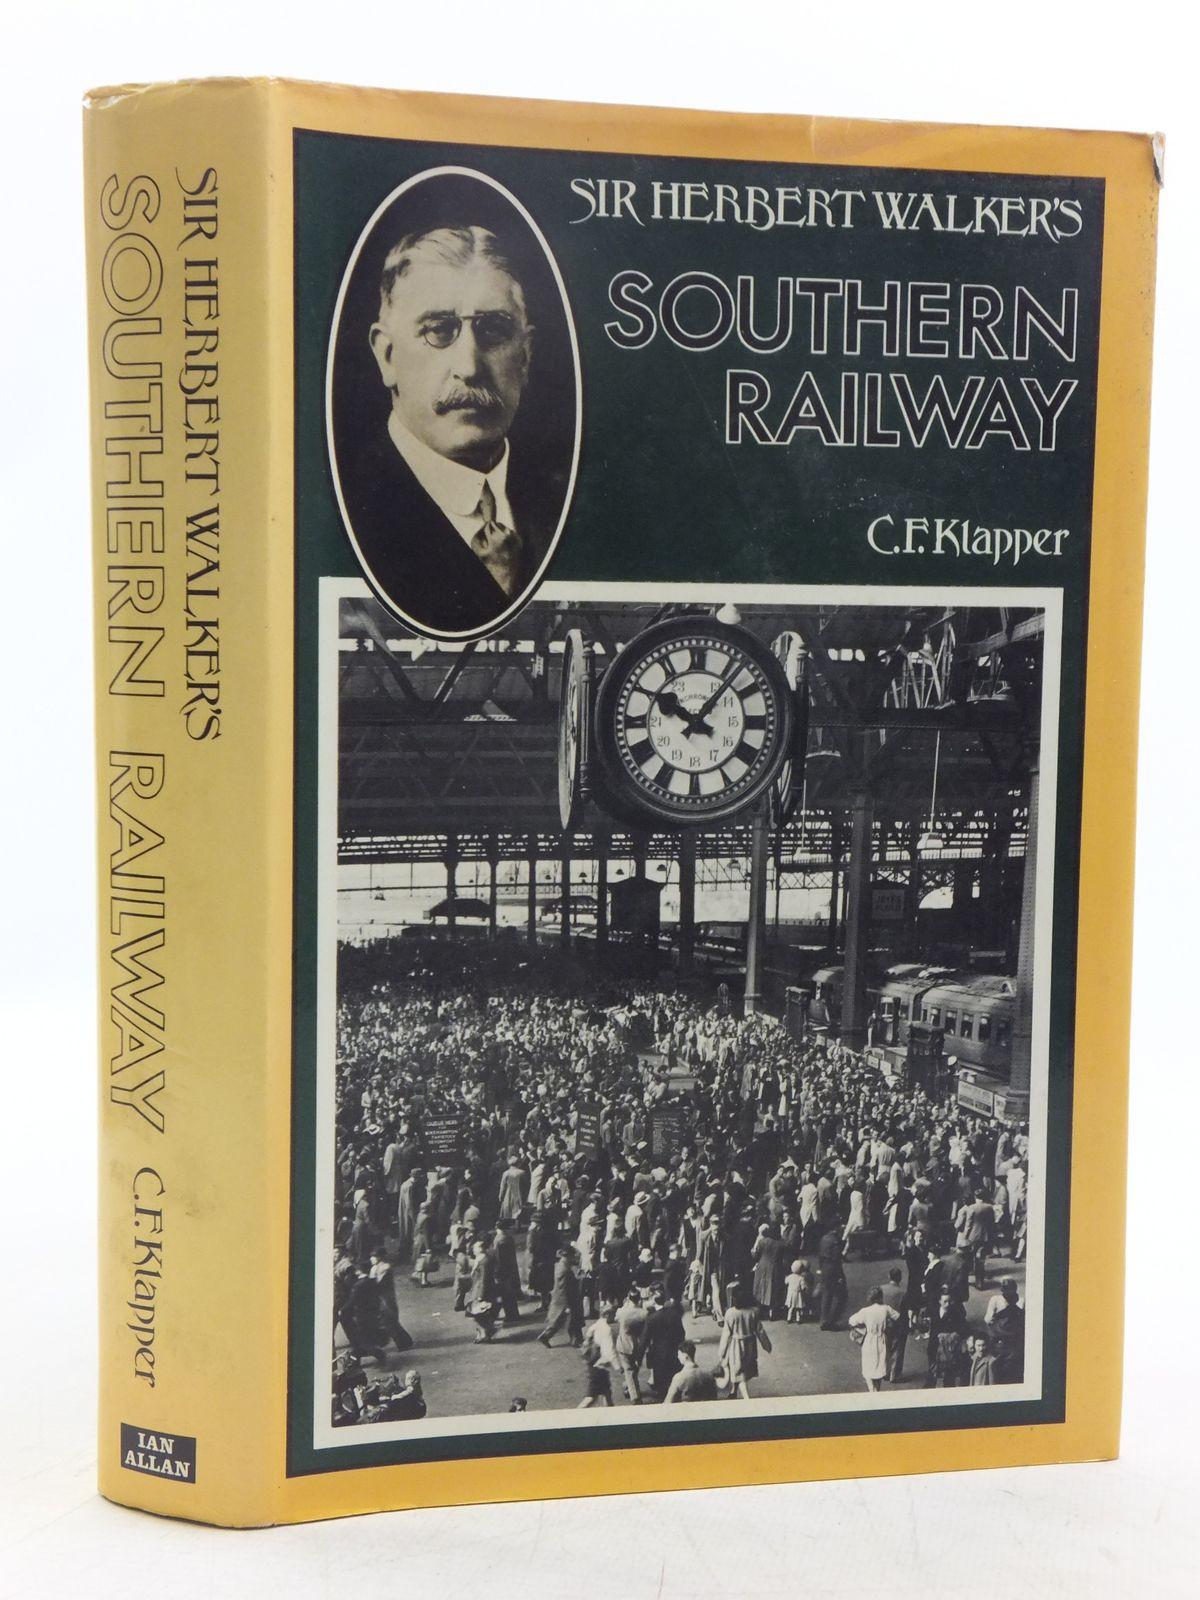 Photo of SIR HERBERT WALKER'S SOUTHERN RAILWAY written by Klapper, C.F. published by Ian Allan Ltd. (STOCK CODE: 2118656)  for sale by Stella & Rose's Books